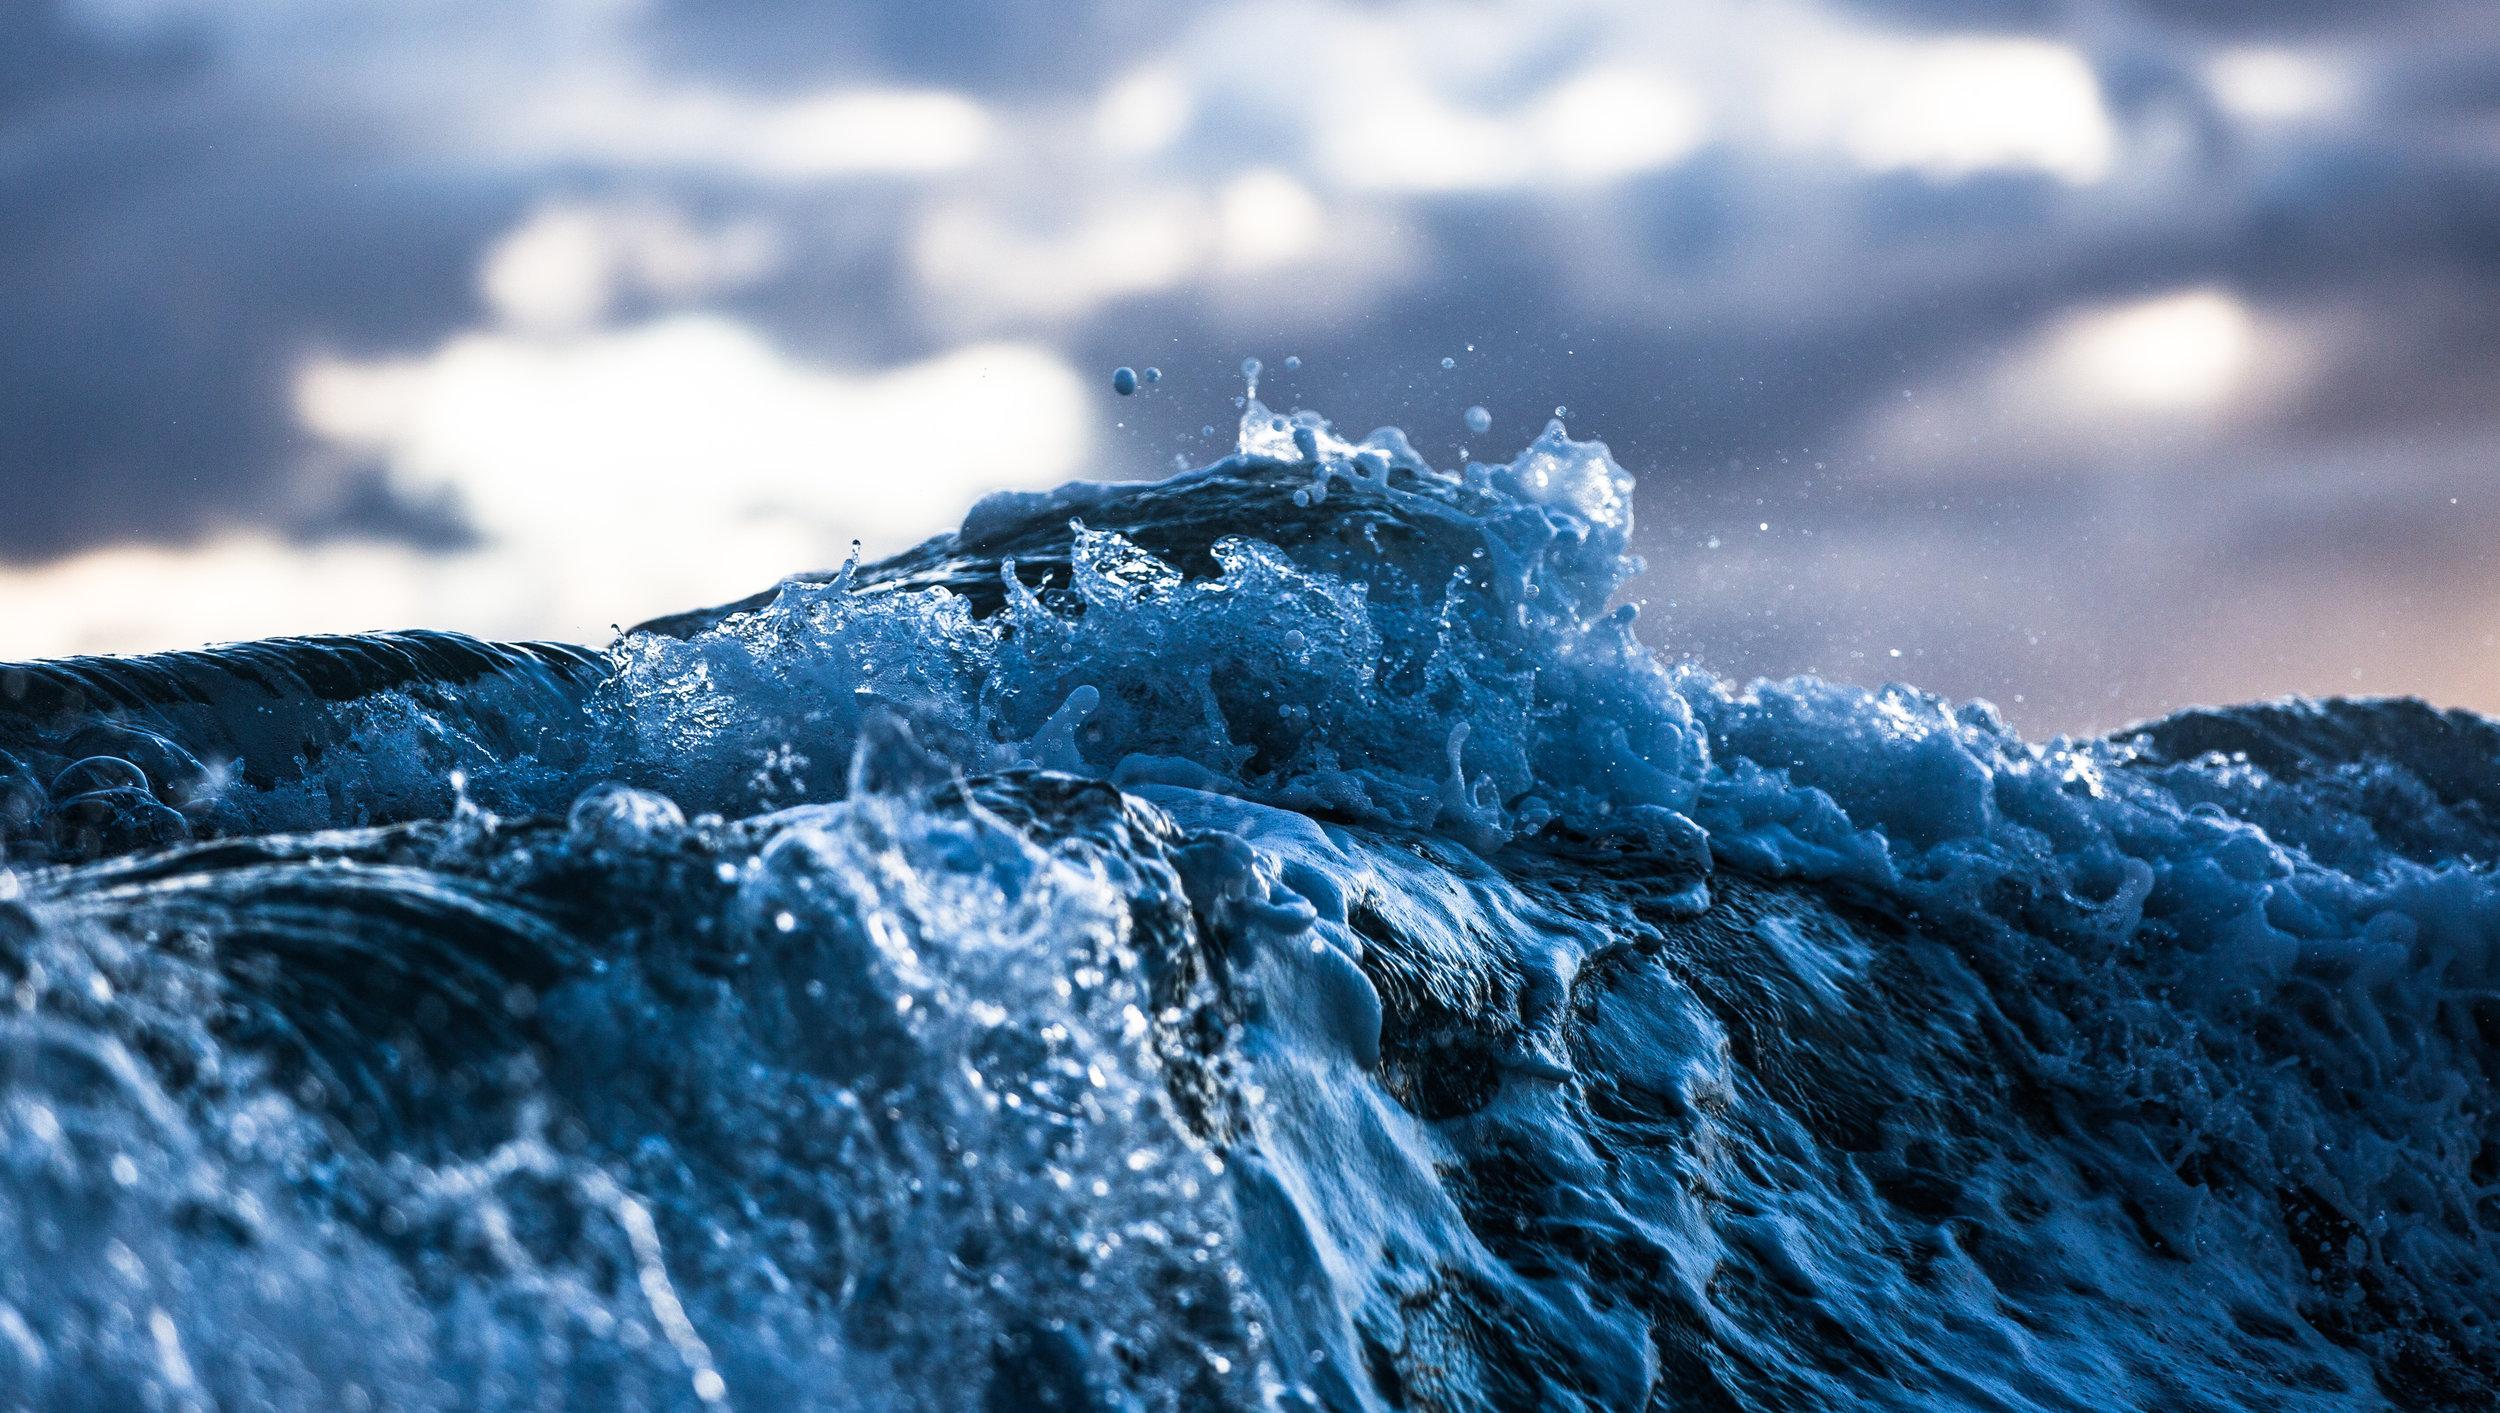 Jake Plumridge_Water Mountain_Photography.jpg